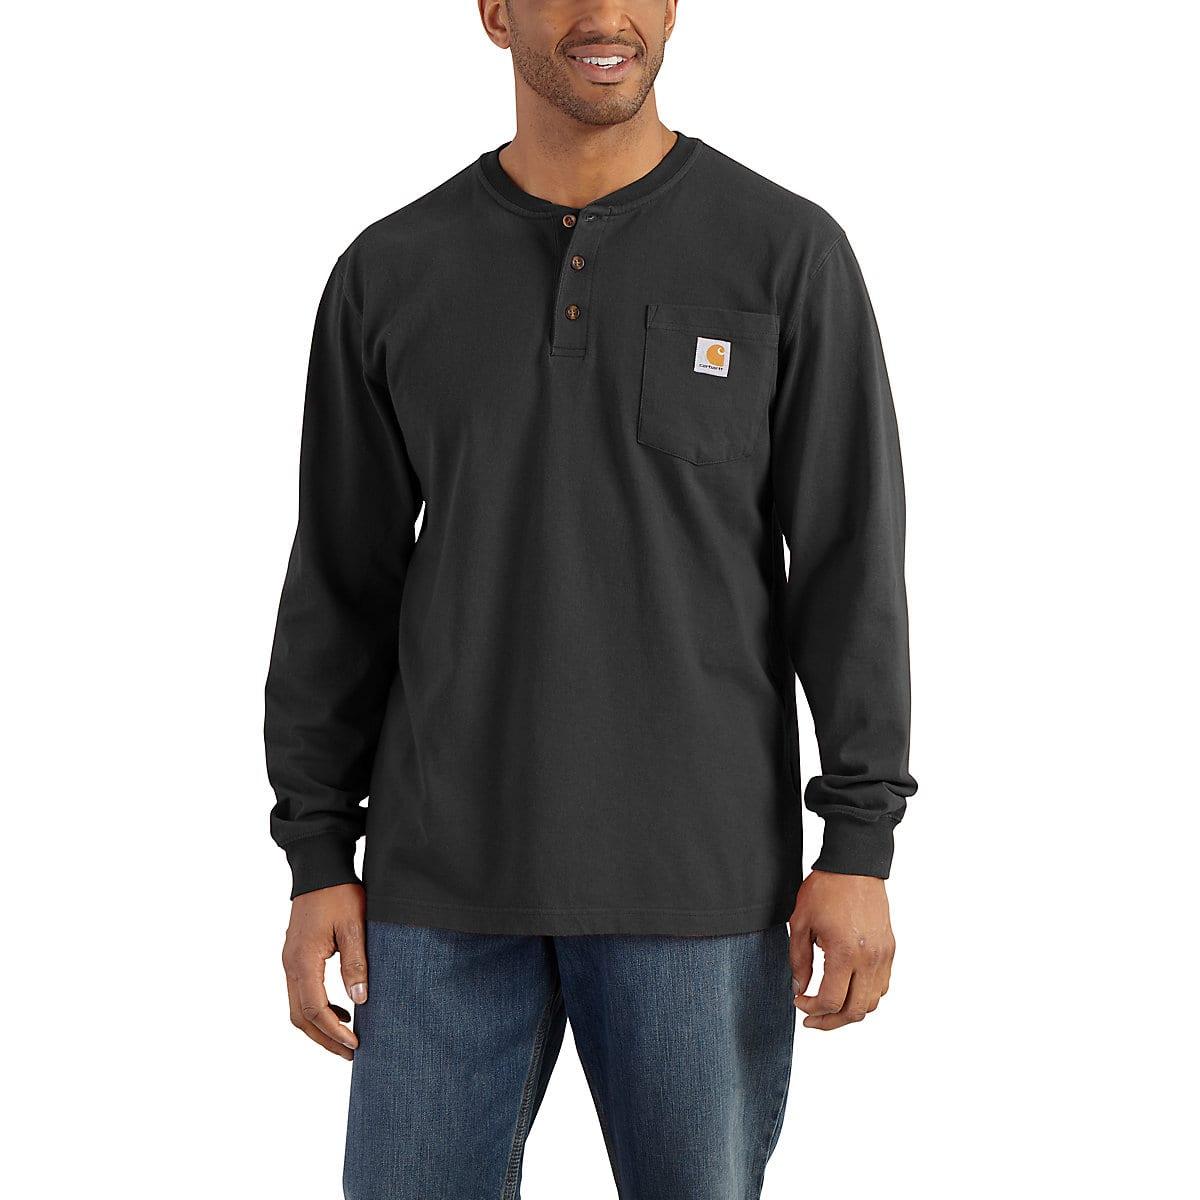 79441ef8c Men's Workwear Long-Sleeve Henley T-Shirt K128 | Carhartt